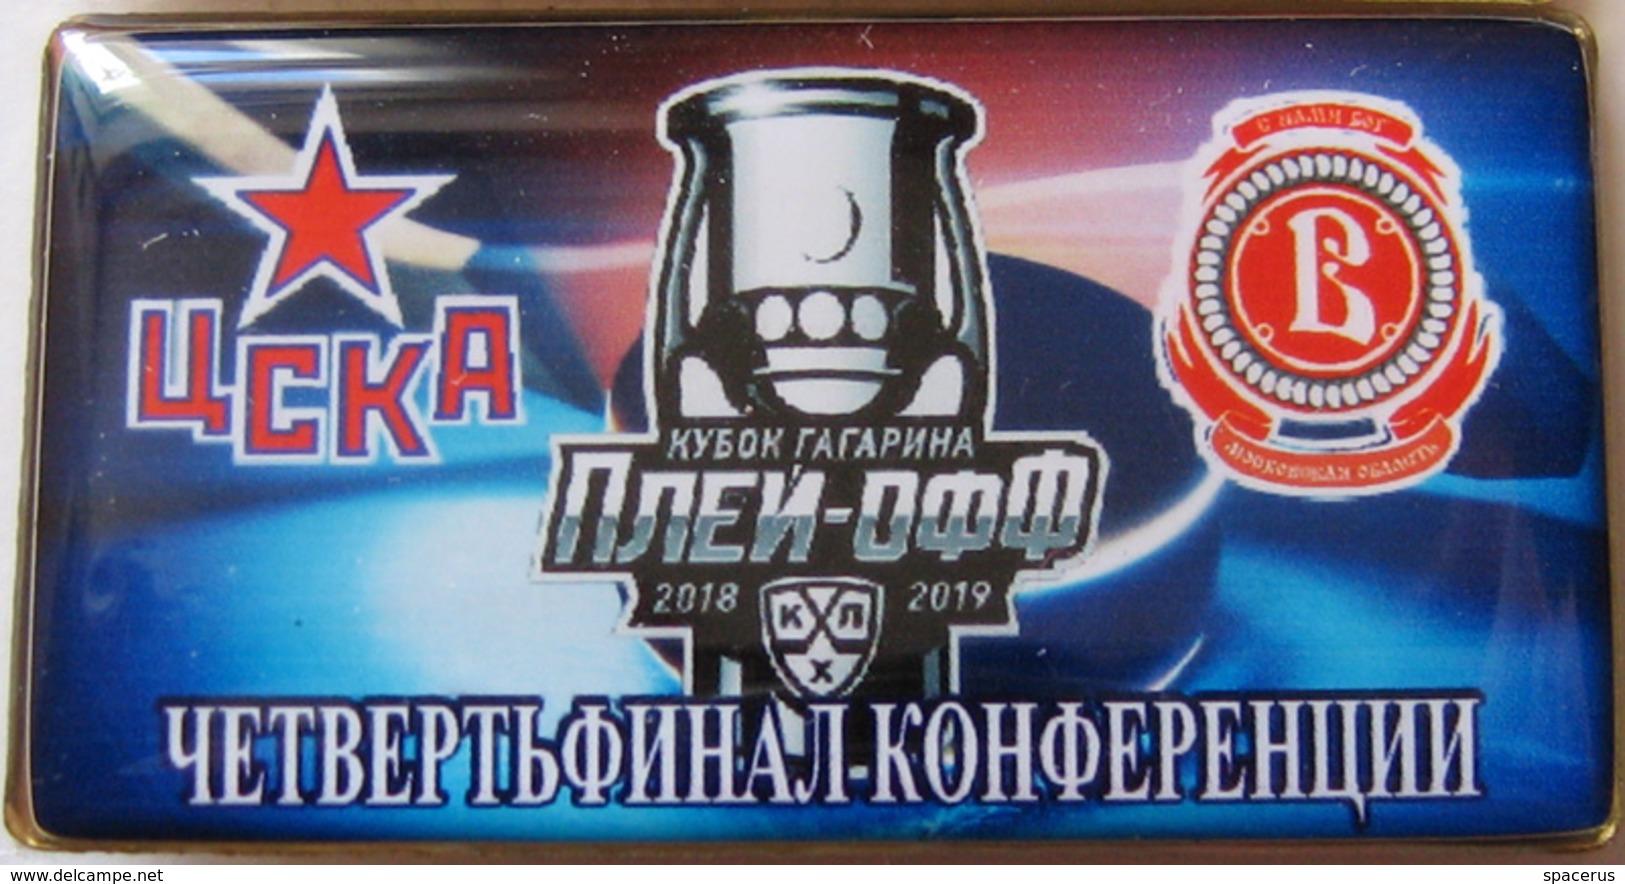 686-1 Space - Sport Russian Pin Hocky Gagarin Cup CSKA (Moscow) - Vityaz (Podolsk) 2018-19 (40х22mm) - Space